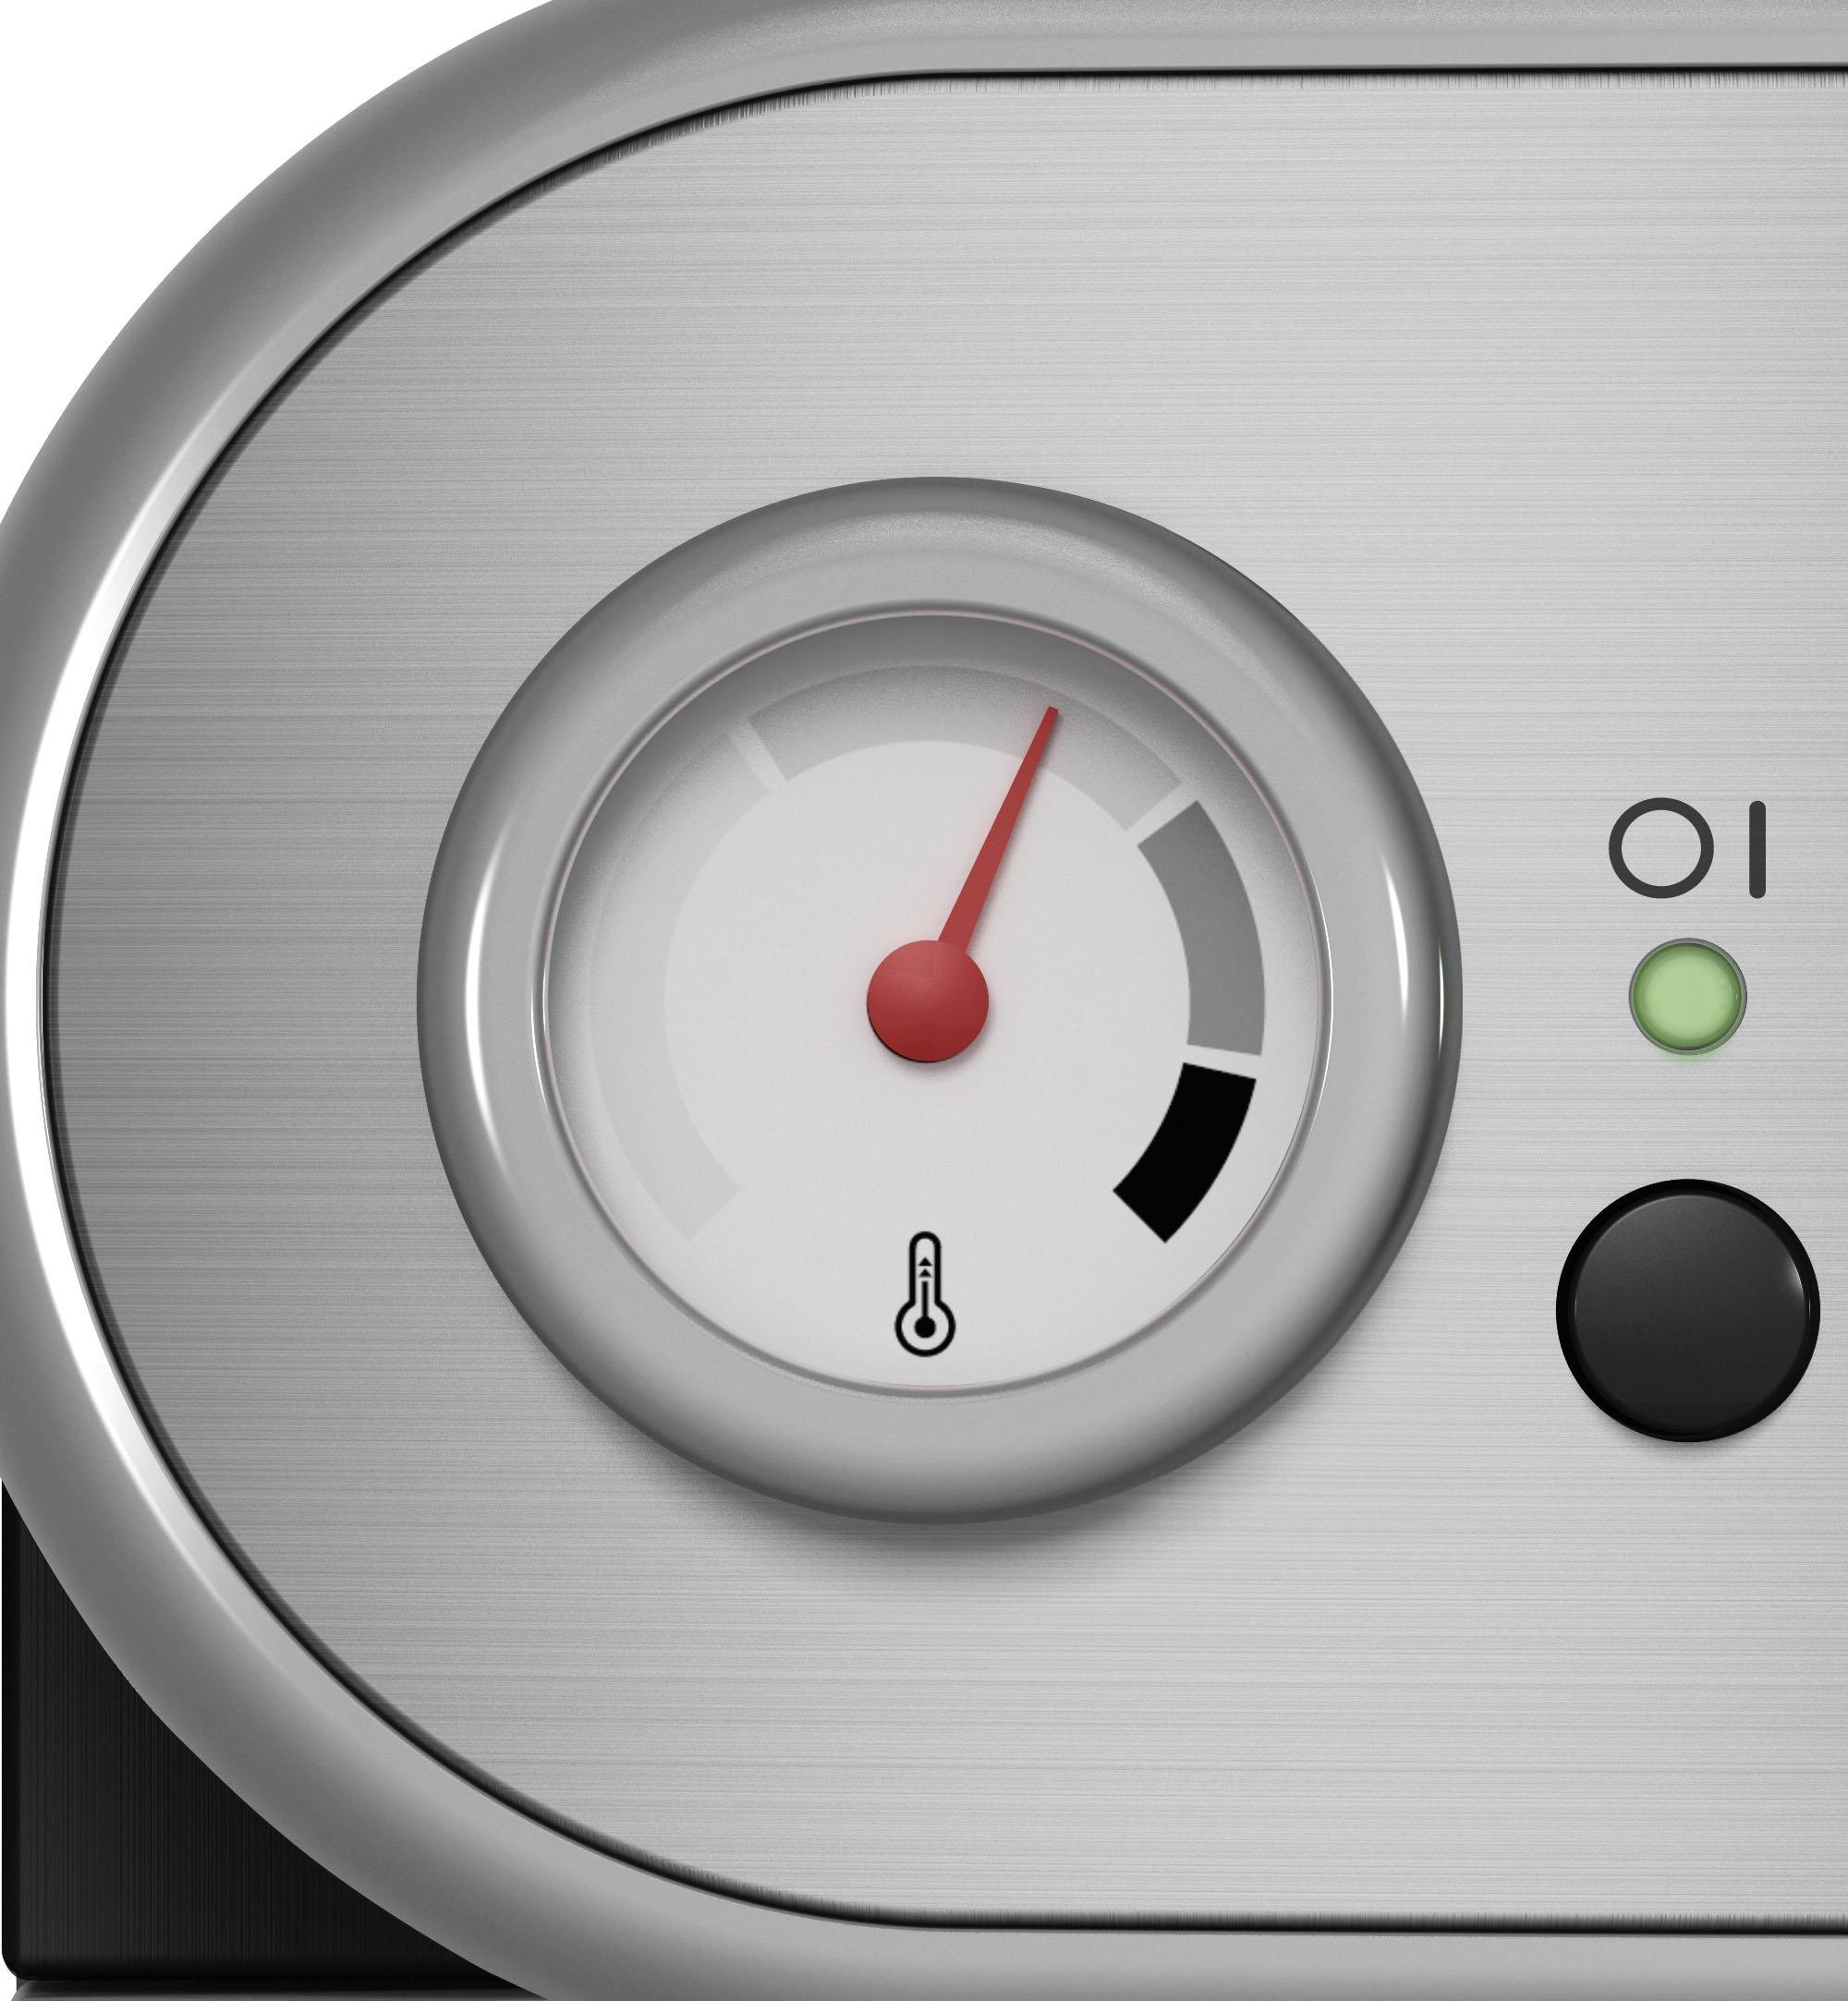 Gaggia-RI852508-Carezza-Manual-Coffee-Machine-grey